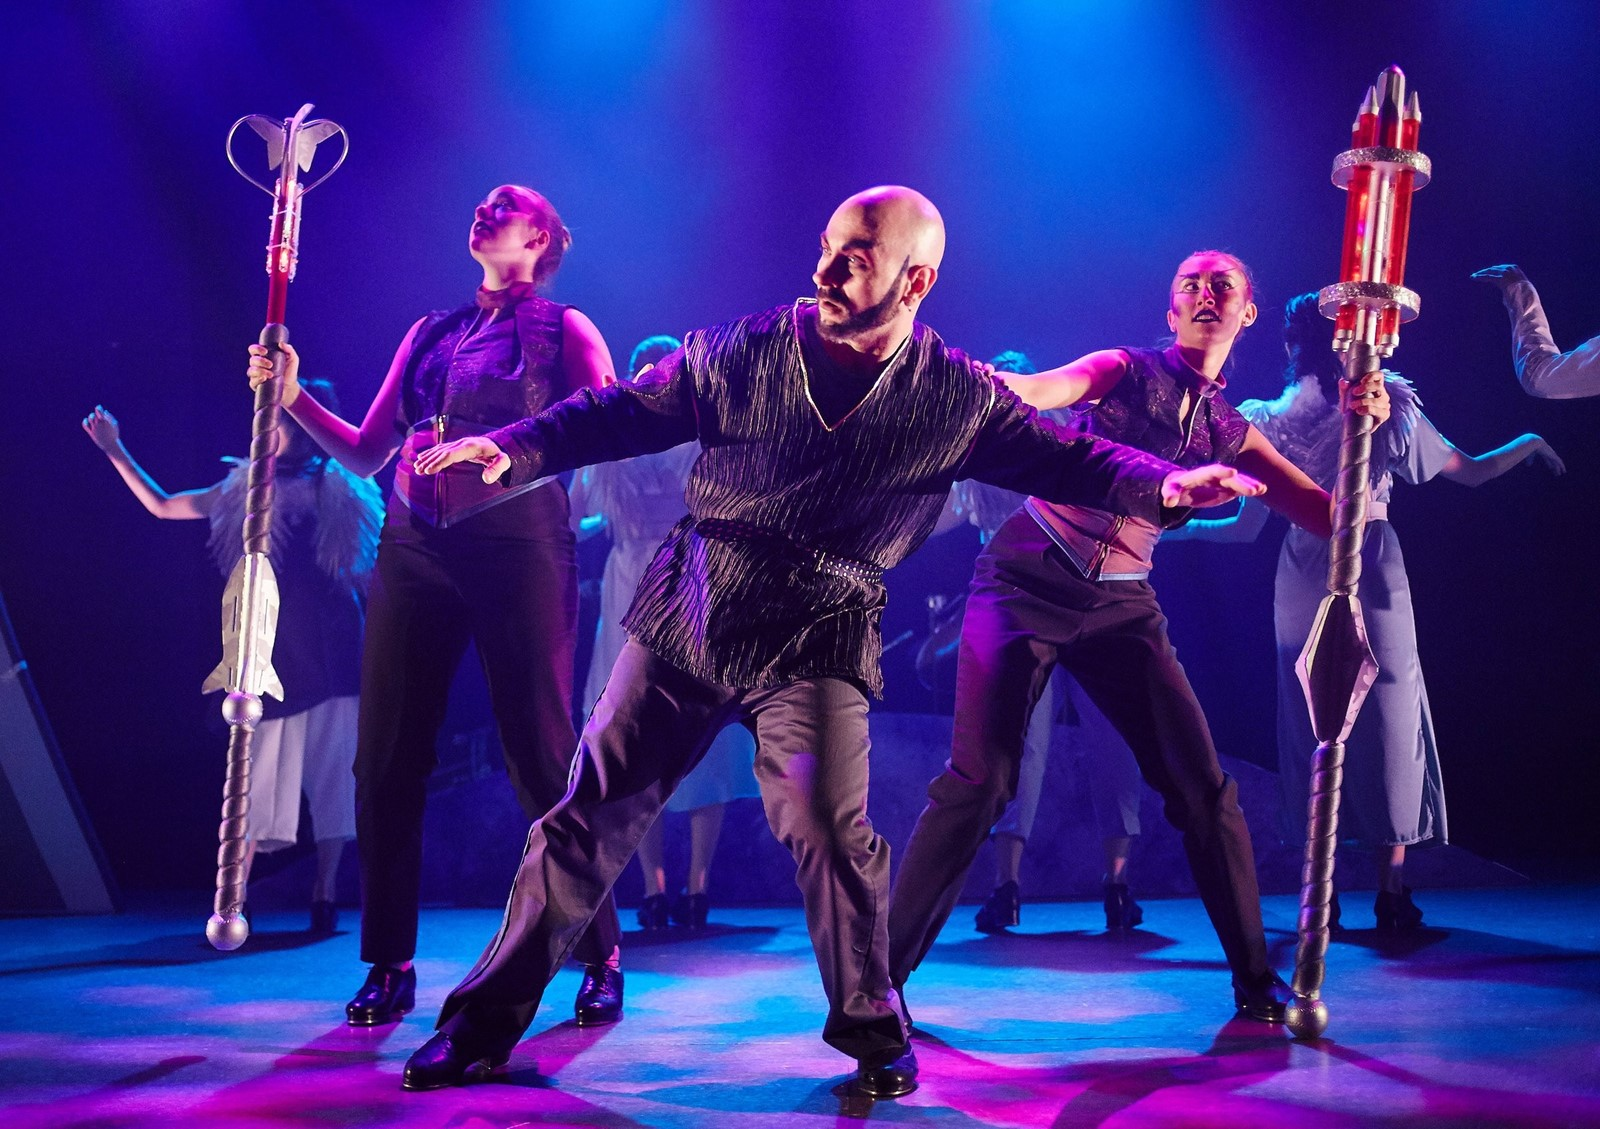 Tap opera juggles big themes, daffy plot, Bowie, lasers - West